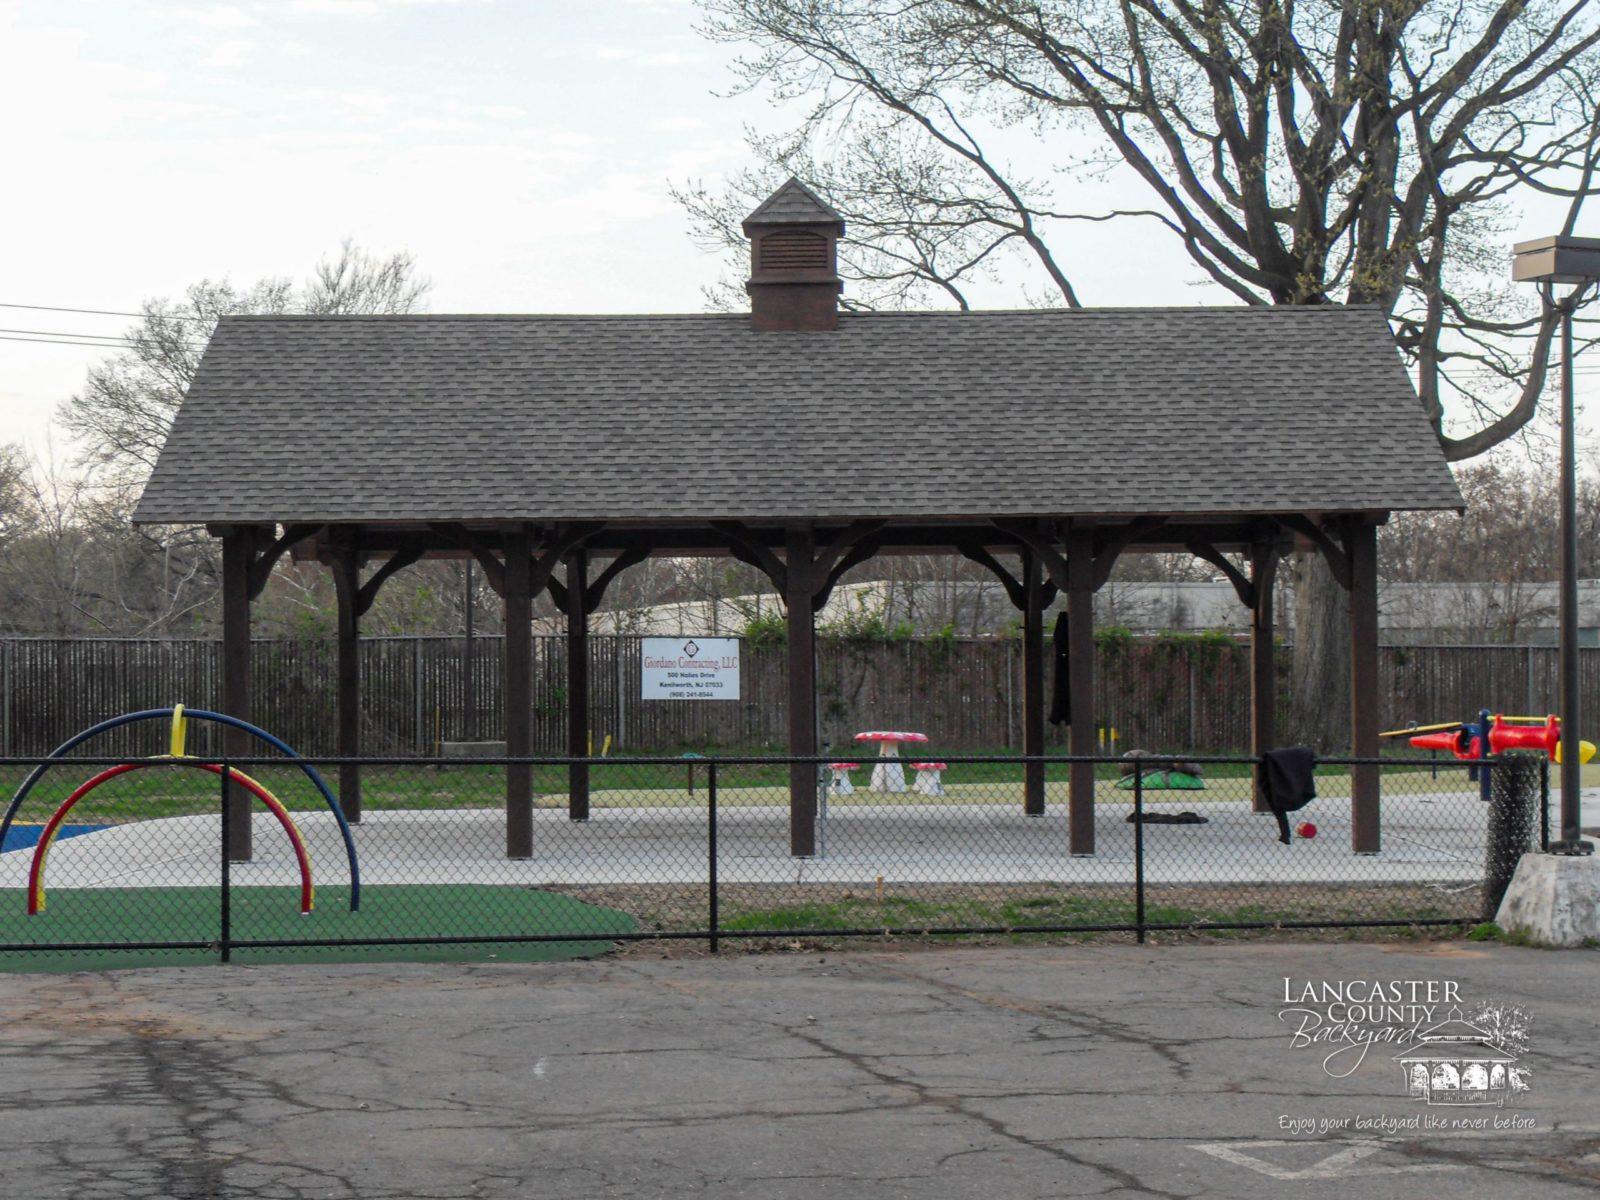 20x32 denali timber frame pavilion for daycare